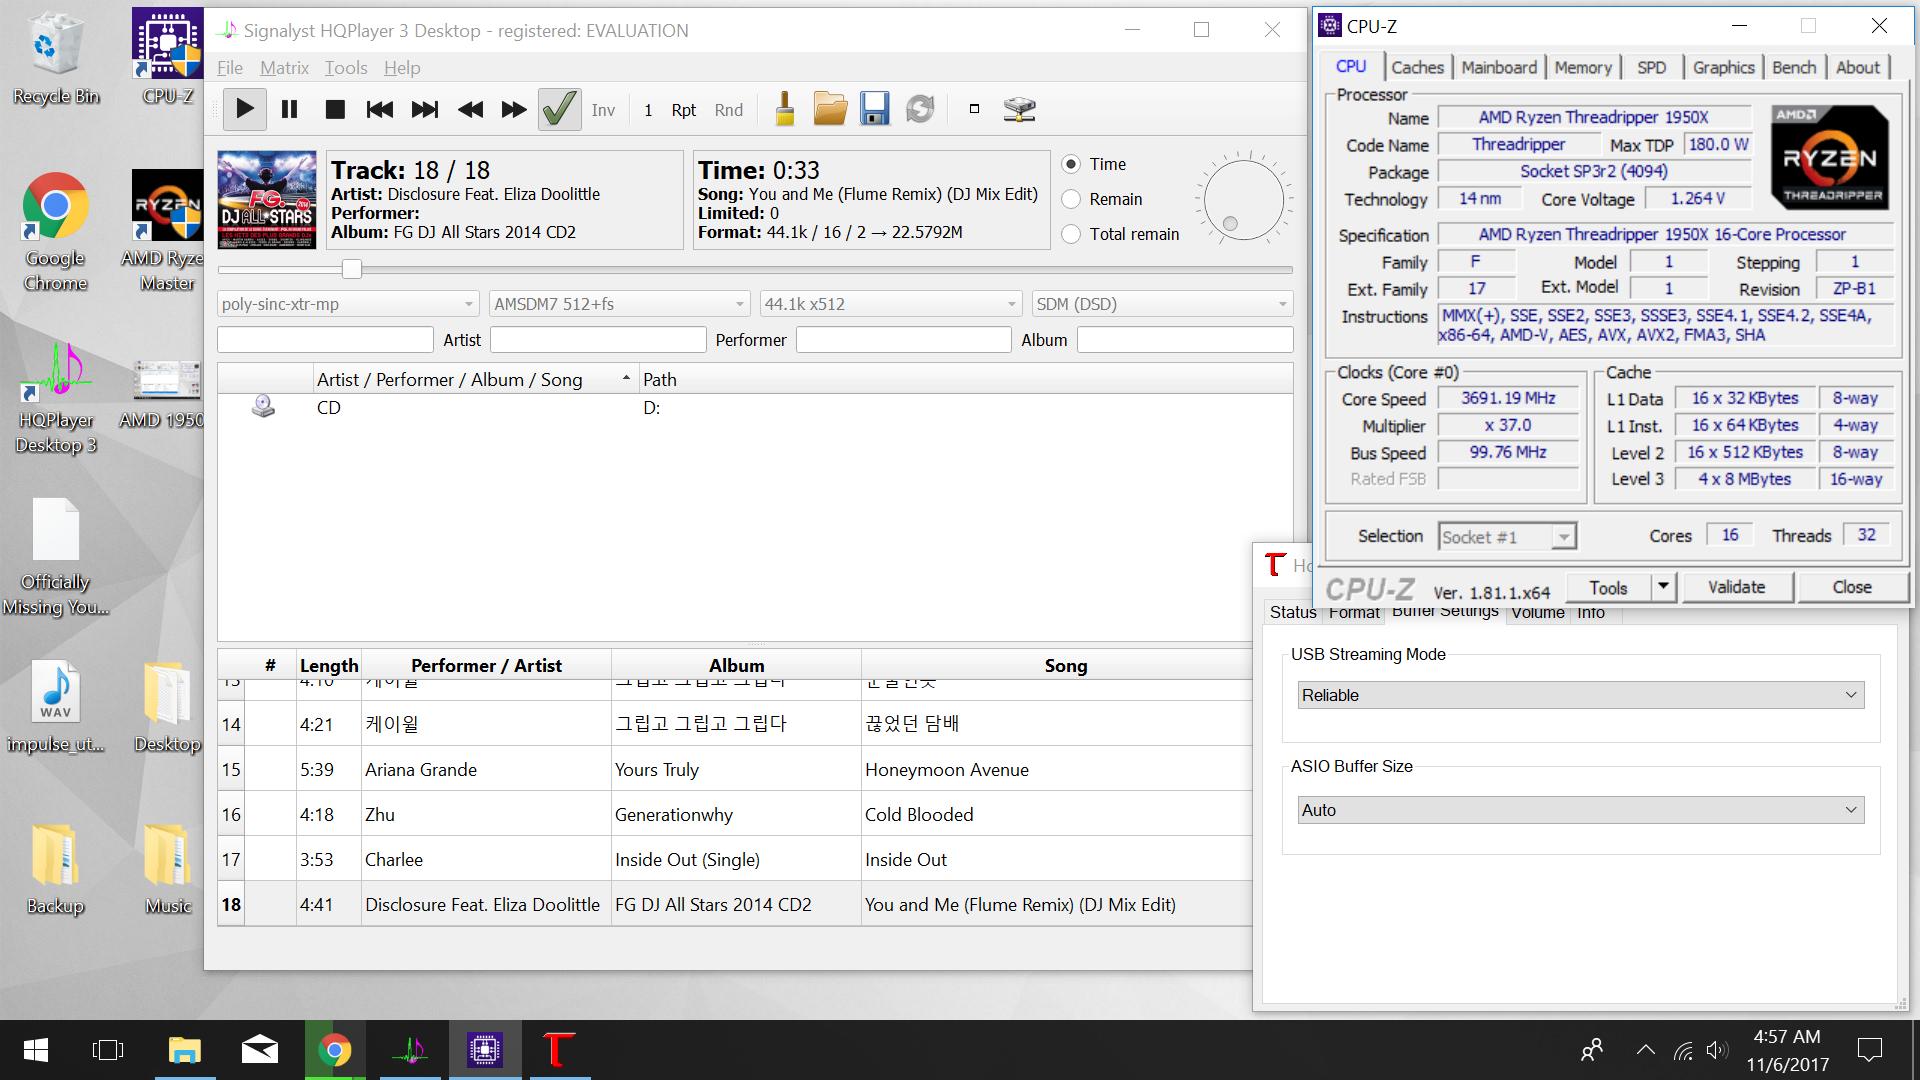 New Holo Audio Cyan DAC/AMP: PCM or DSD module?